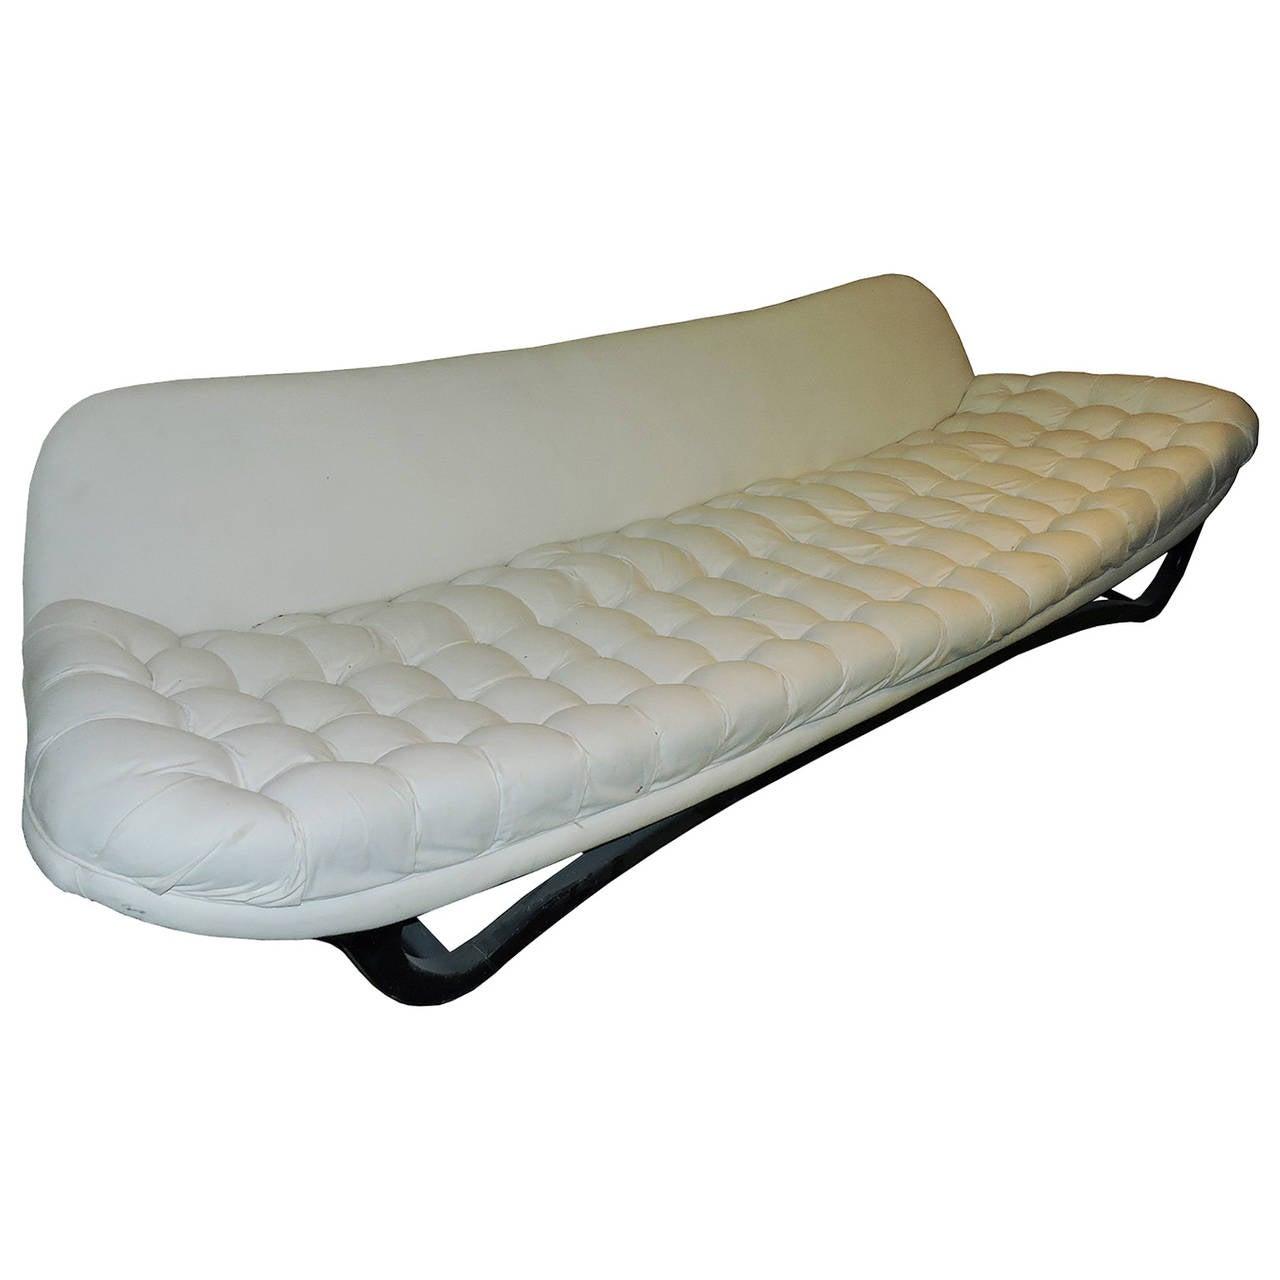 Mid-Century Modern White Tufted Sofa